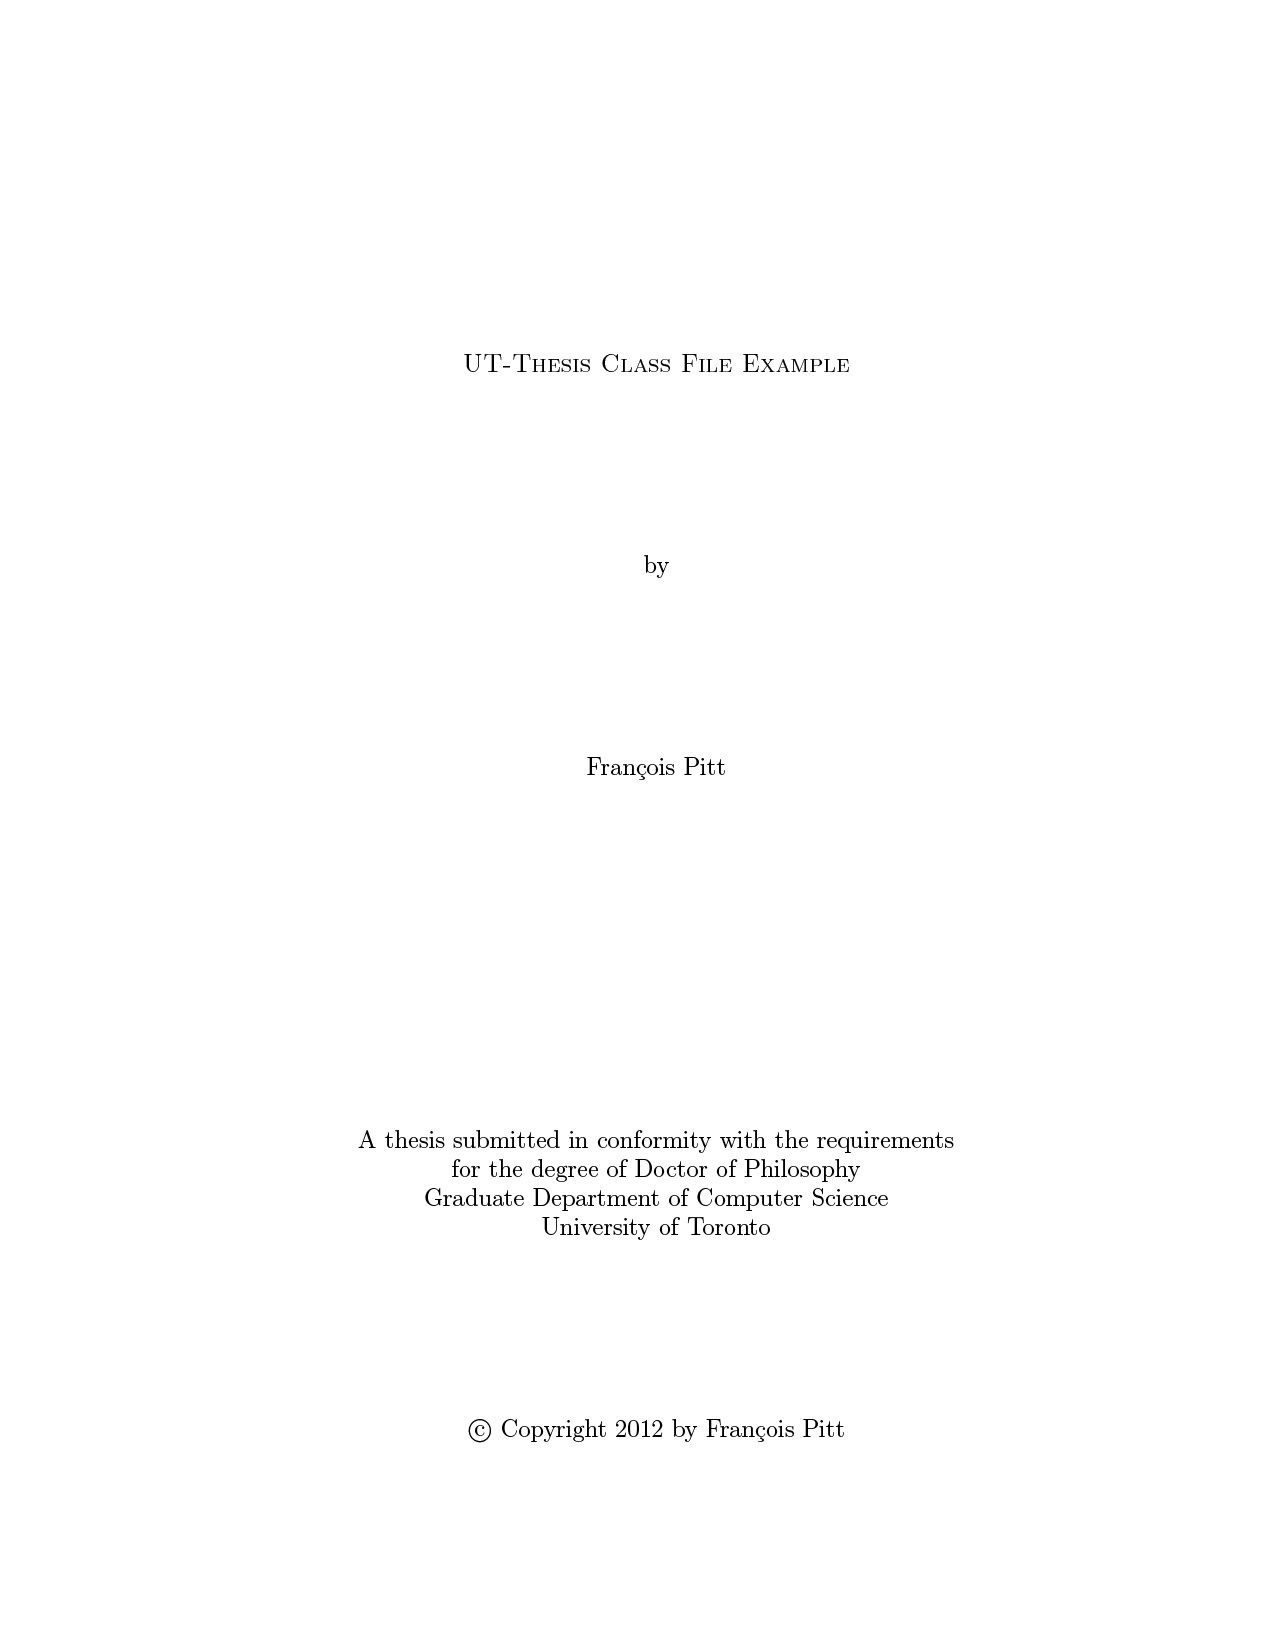 sgs university of toronto thesis template